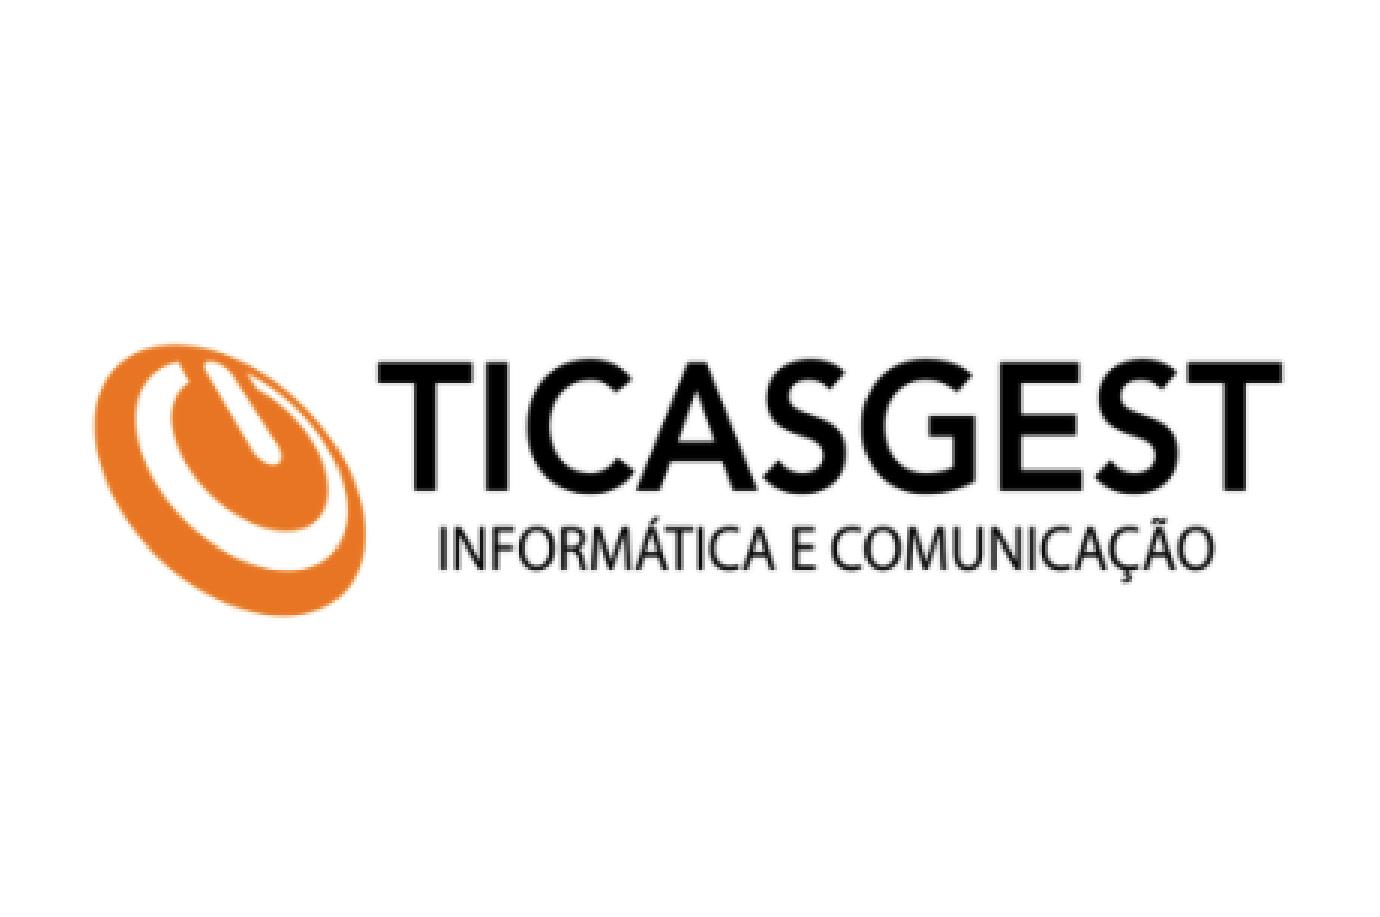 TICASGEST-73